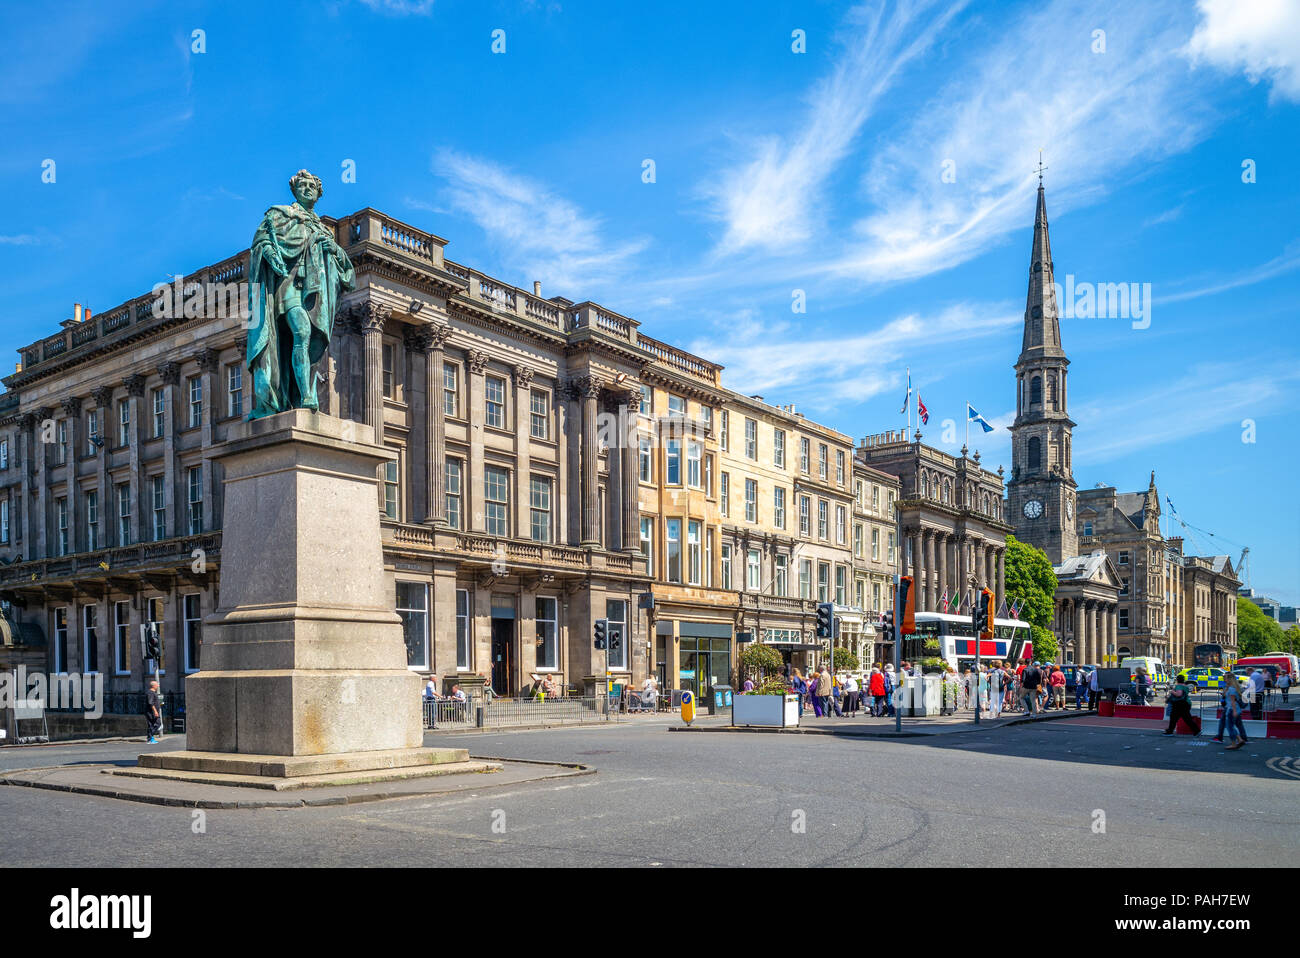 street view of George street at Edinburgh, scotland Stock Photo